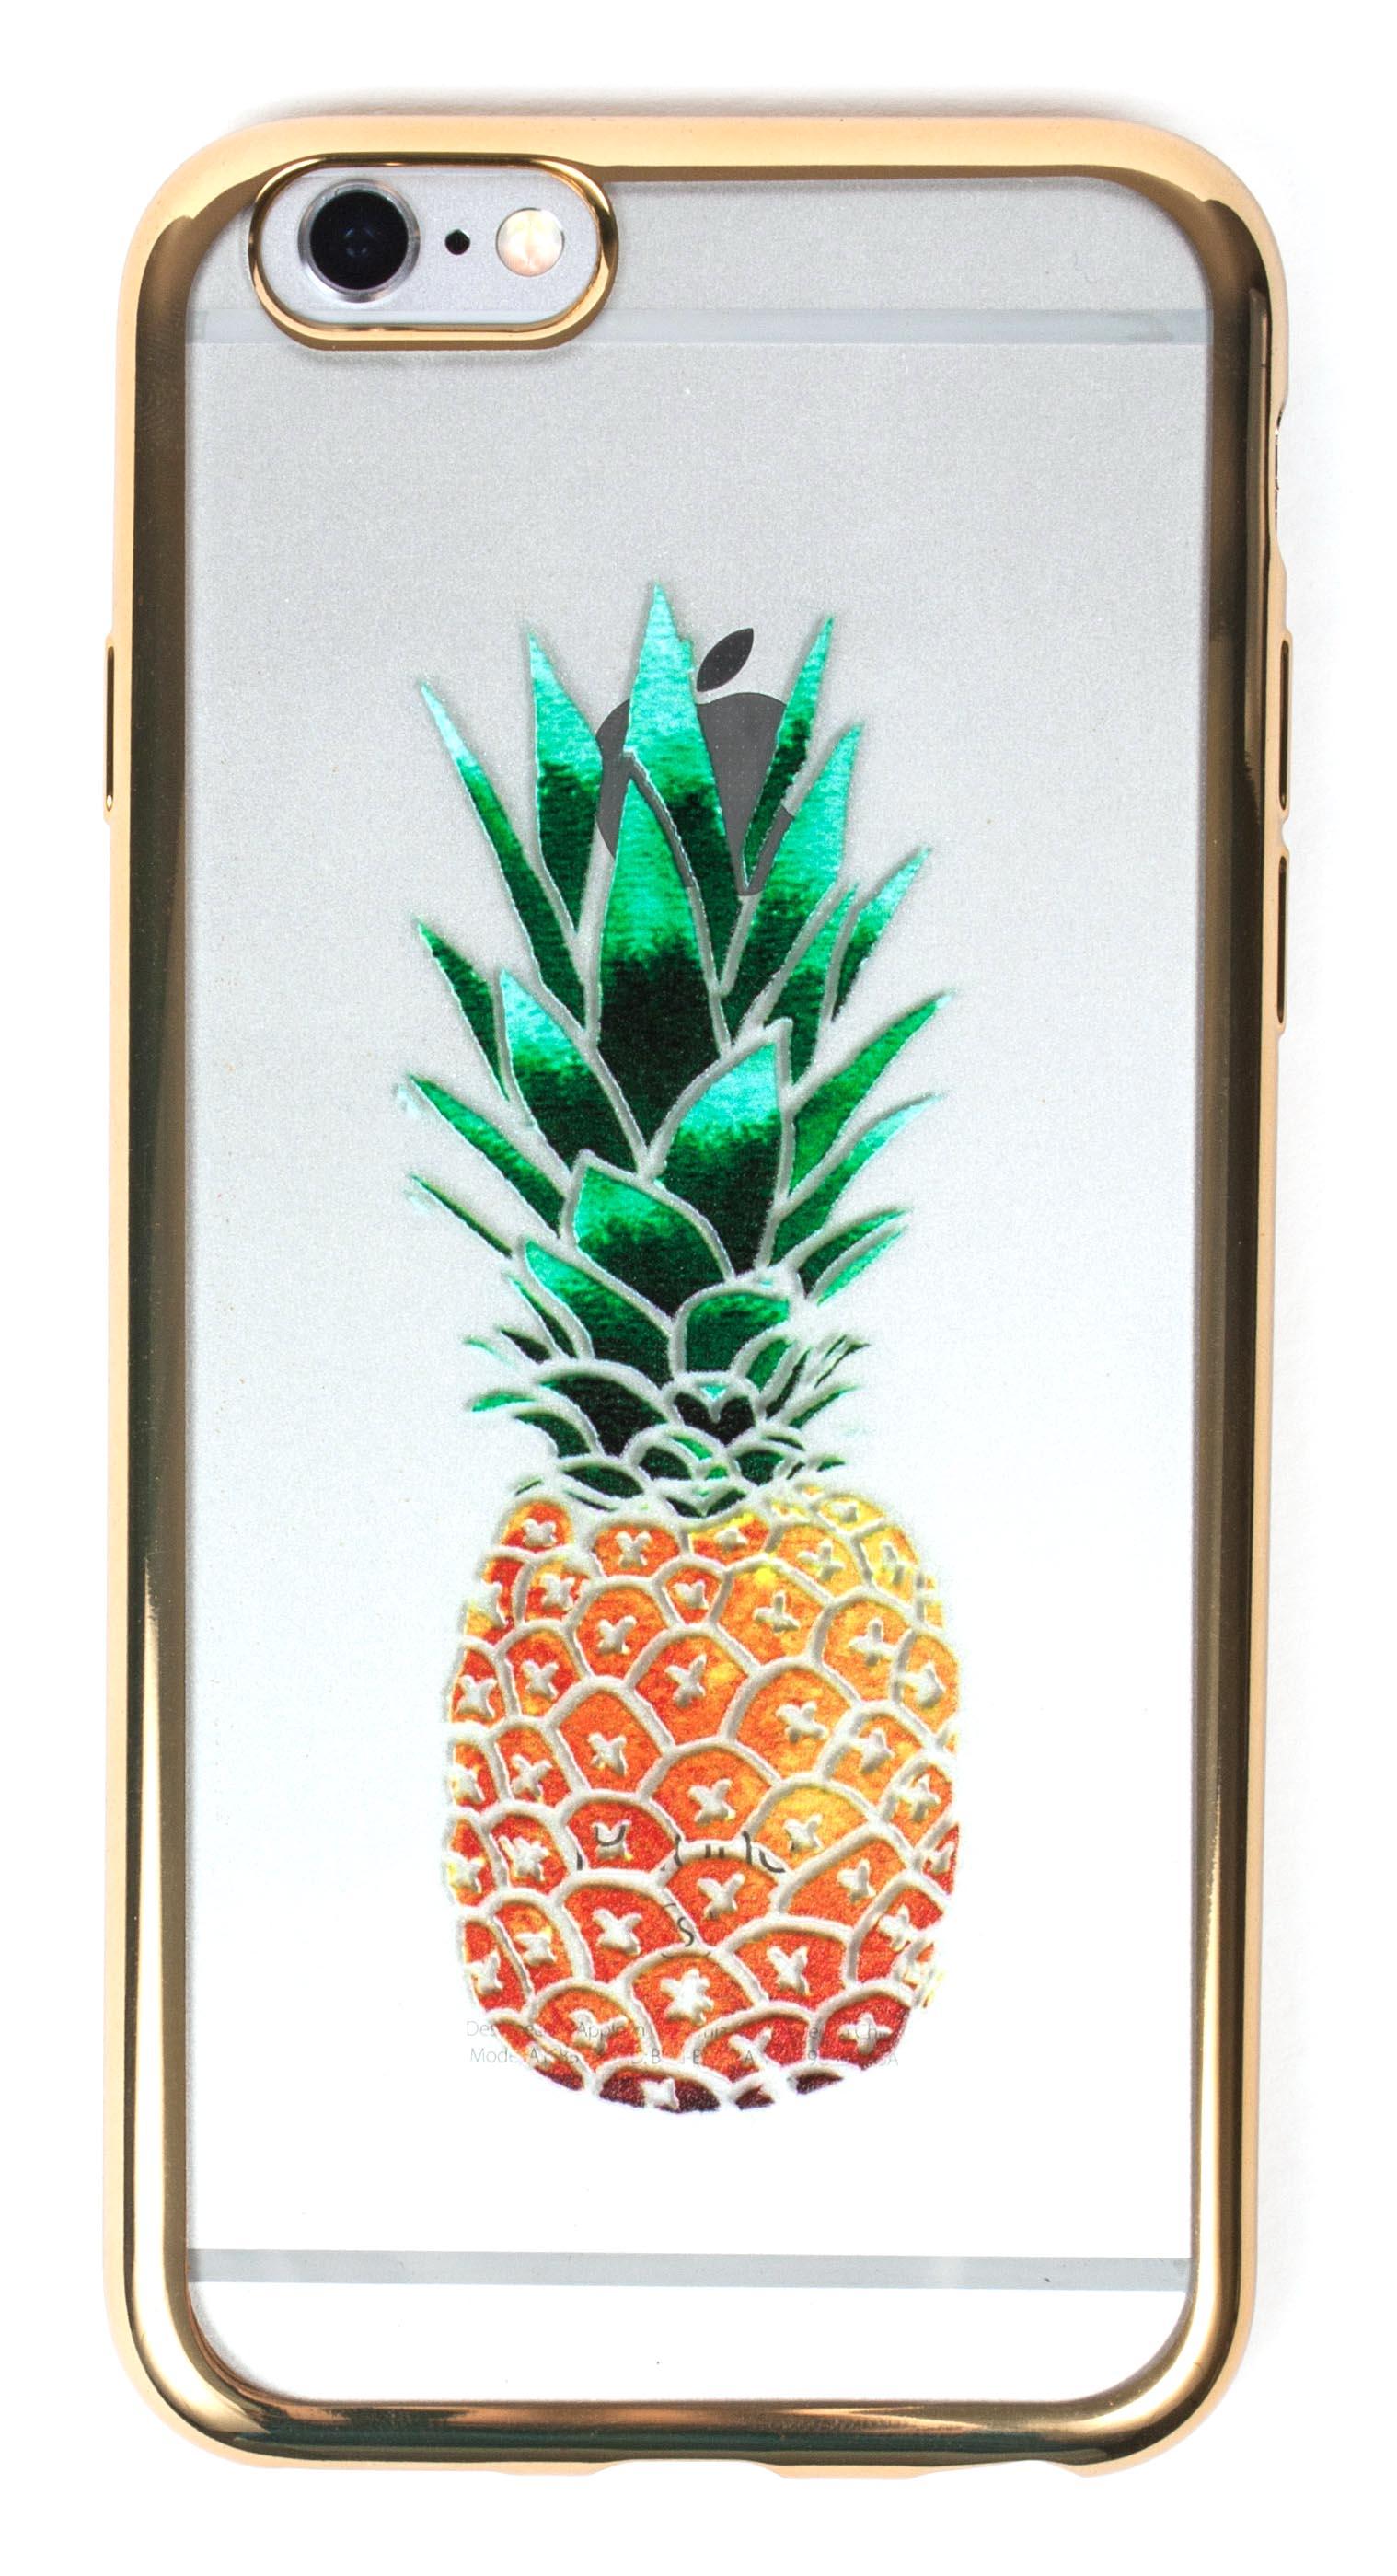 sale retailer 91475 c13af Samsung Galaxy S7 Edge Case, YogaCase MetalEdge Silicone Back Protective  Cover (Pineapple Gold) - YogaCase